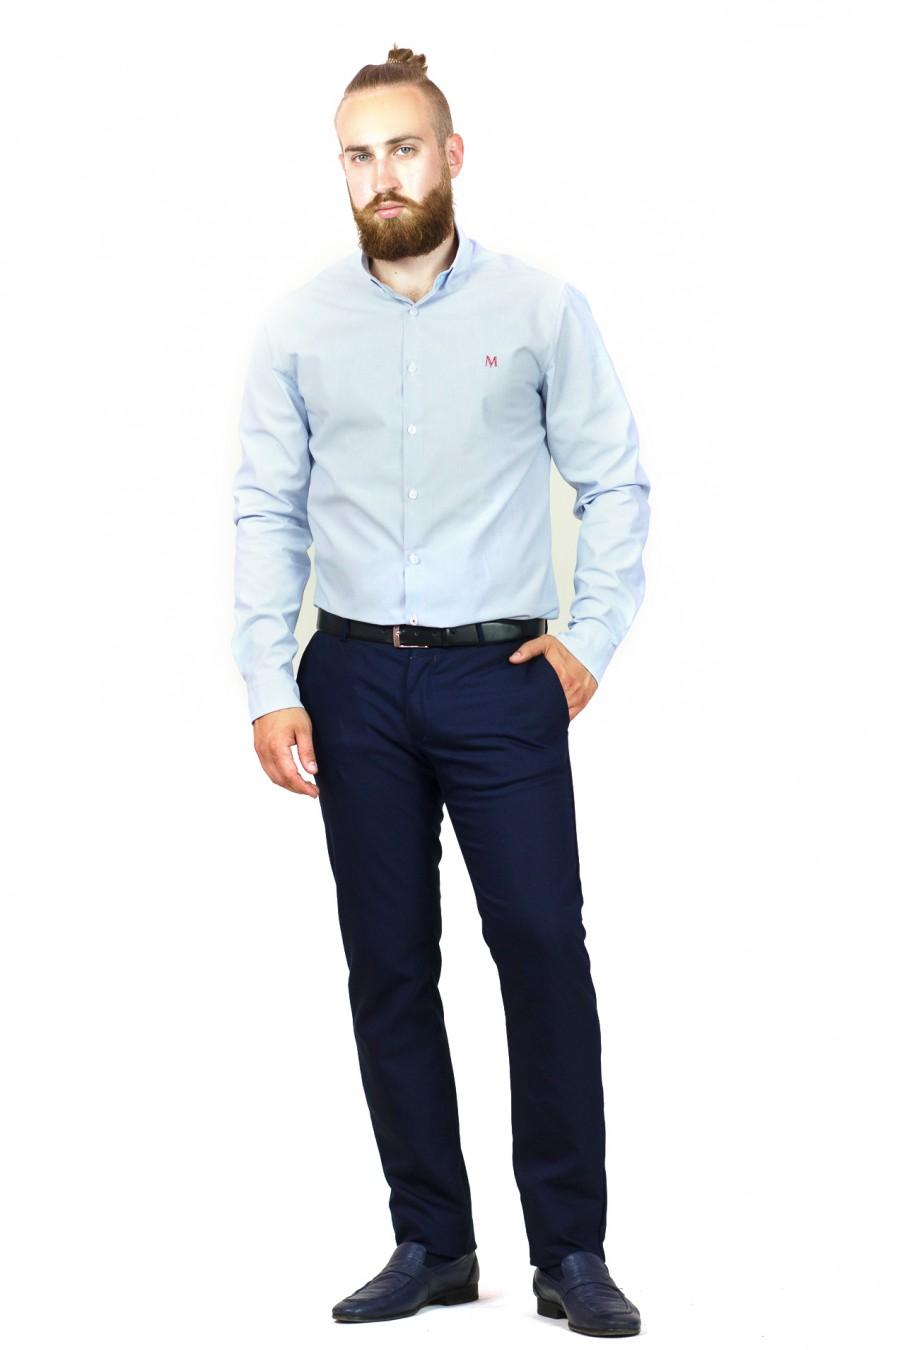 Мужская рубашка S-119